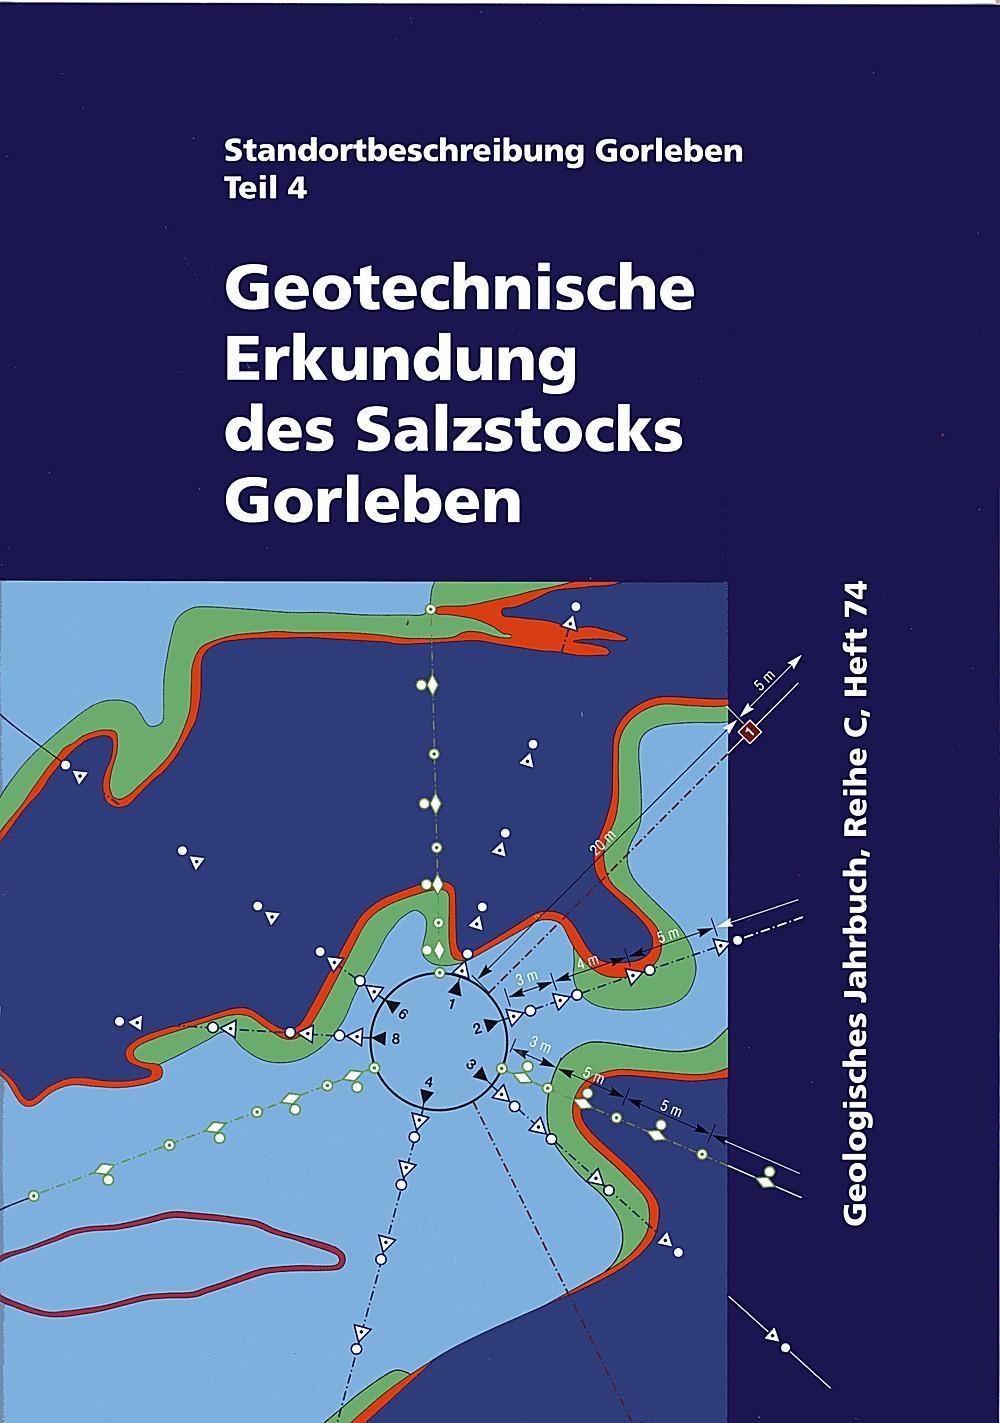 Standortbeschreibung Gorleben Teil 4 | Bräuer / Eickemeier / Eisenburger / Grissemann / Hesser / Heusermann / Kaiser / Nipp / Nowak / Plischke / Schnier / Schulze / Sönnke / Weber, 2012 | Buch (Cover)